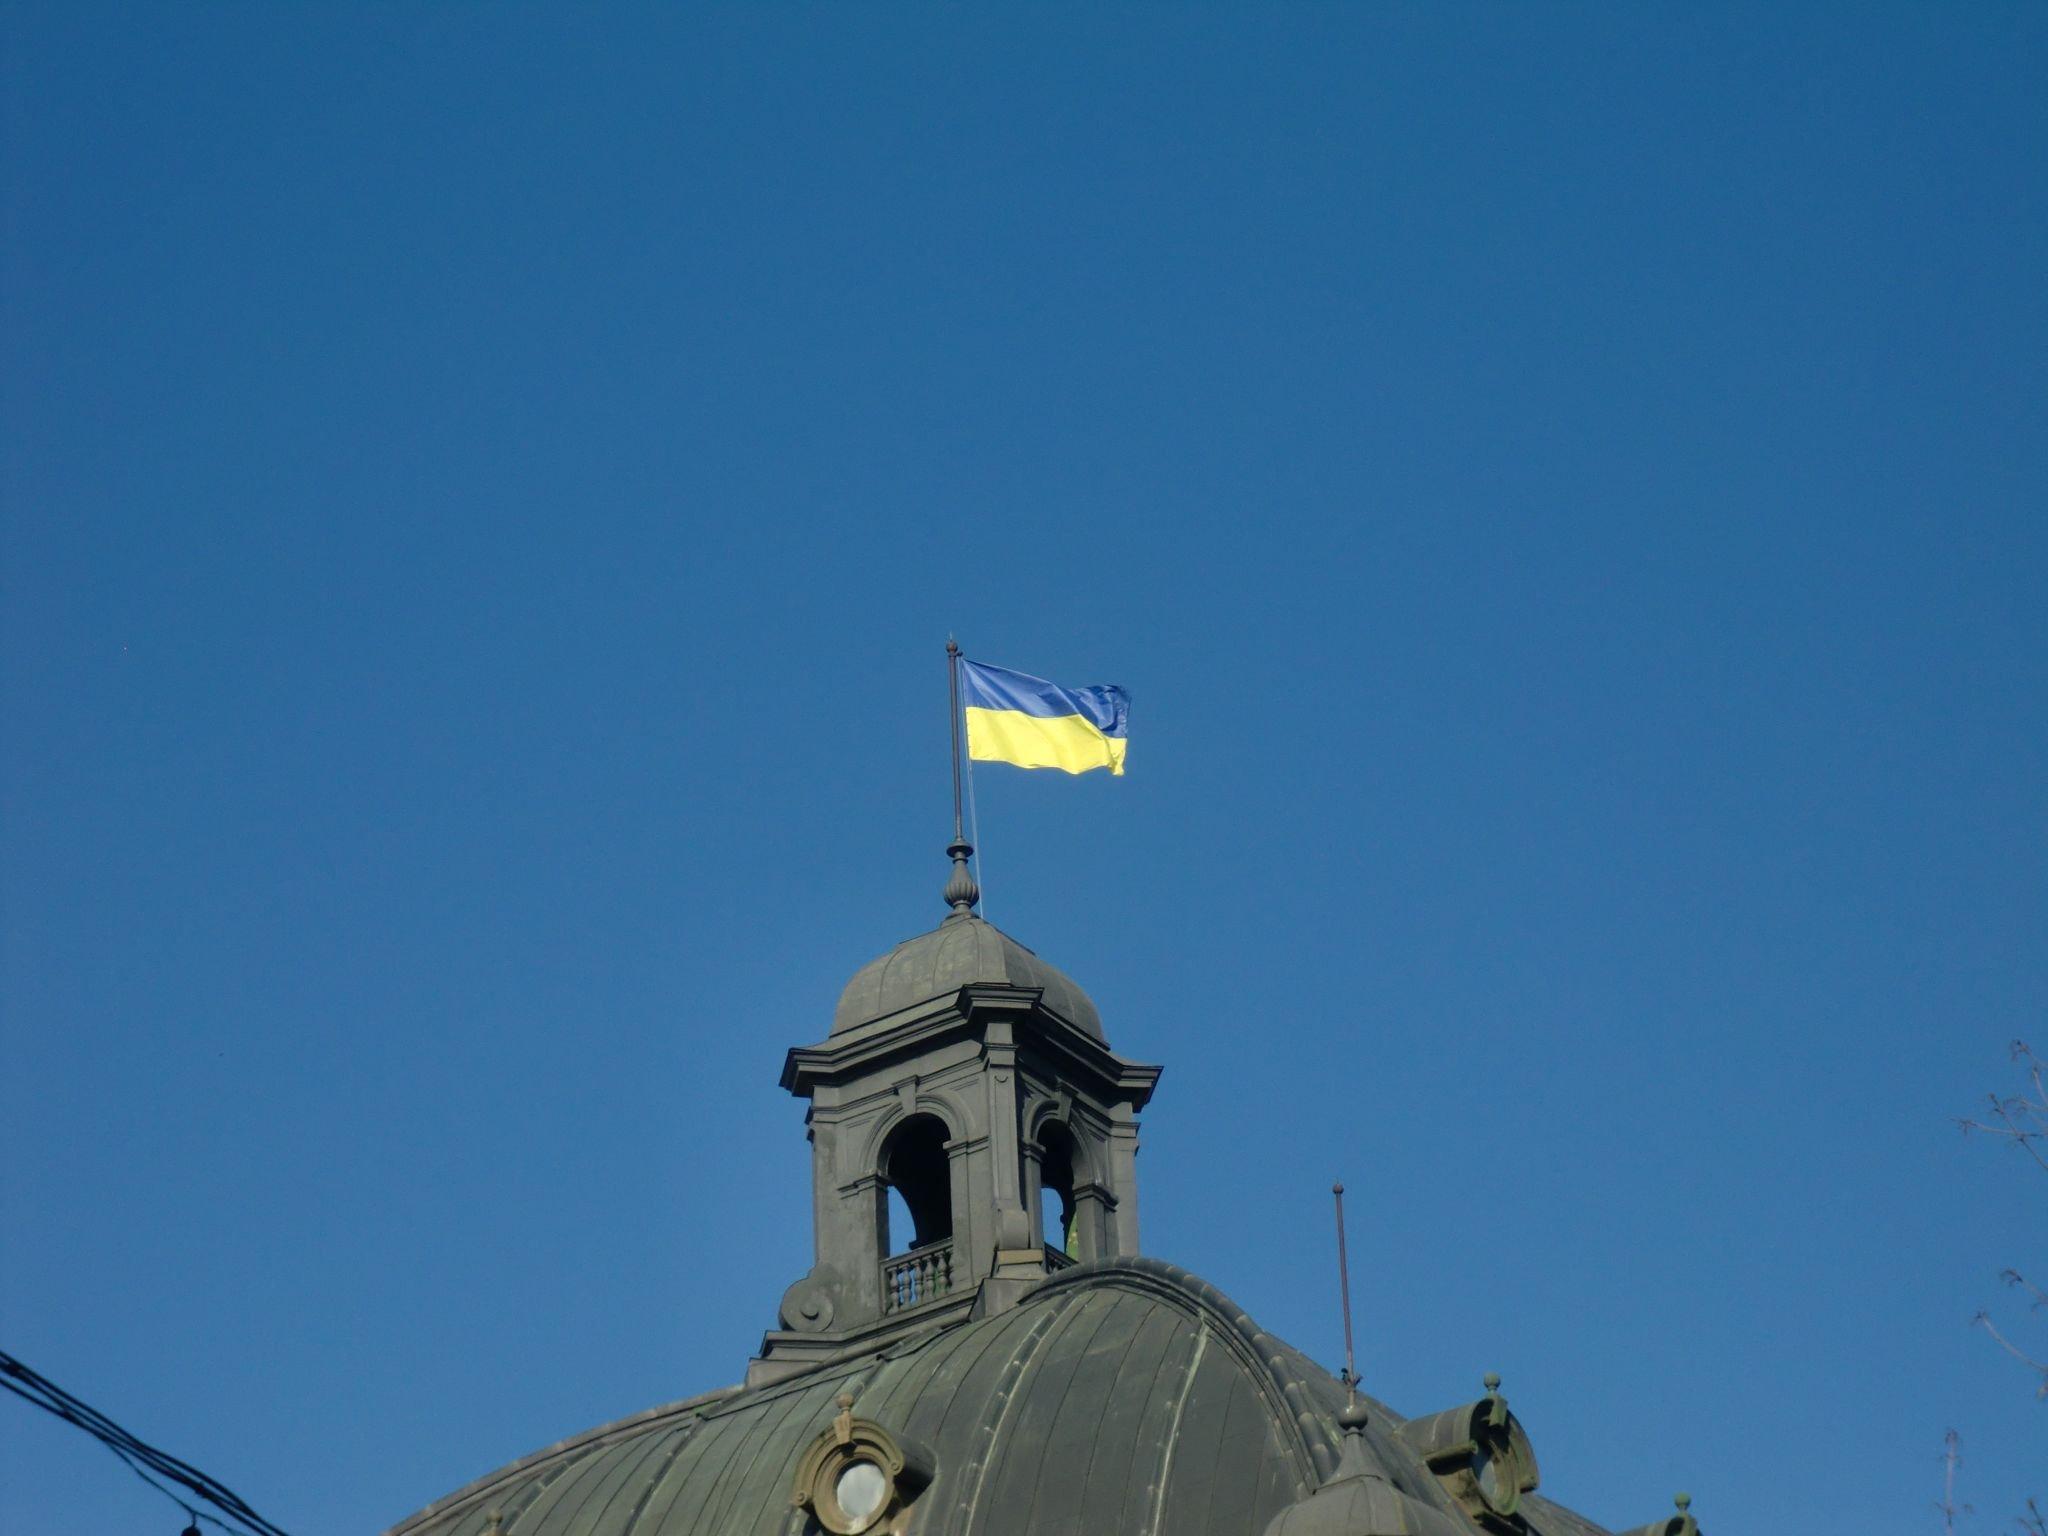 Lviv 14 - Lviv, the Ukrainian pearl